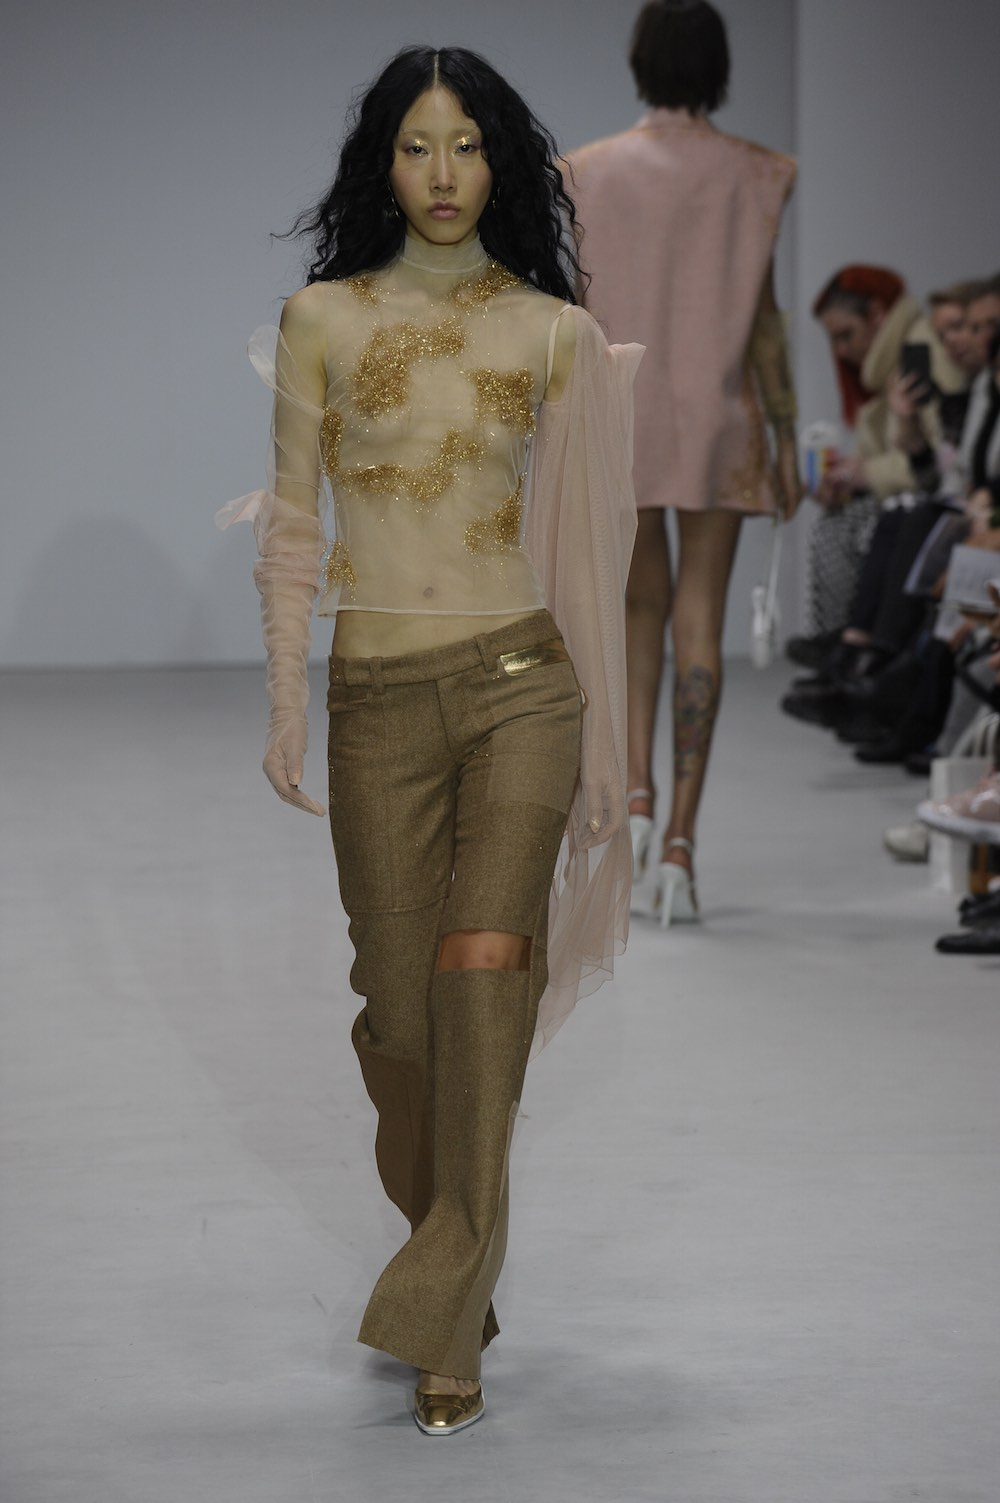 MA Fashion Design Technology Womenswear with Juneyen Chen. Image by Roger Dean.